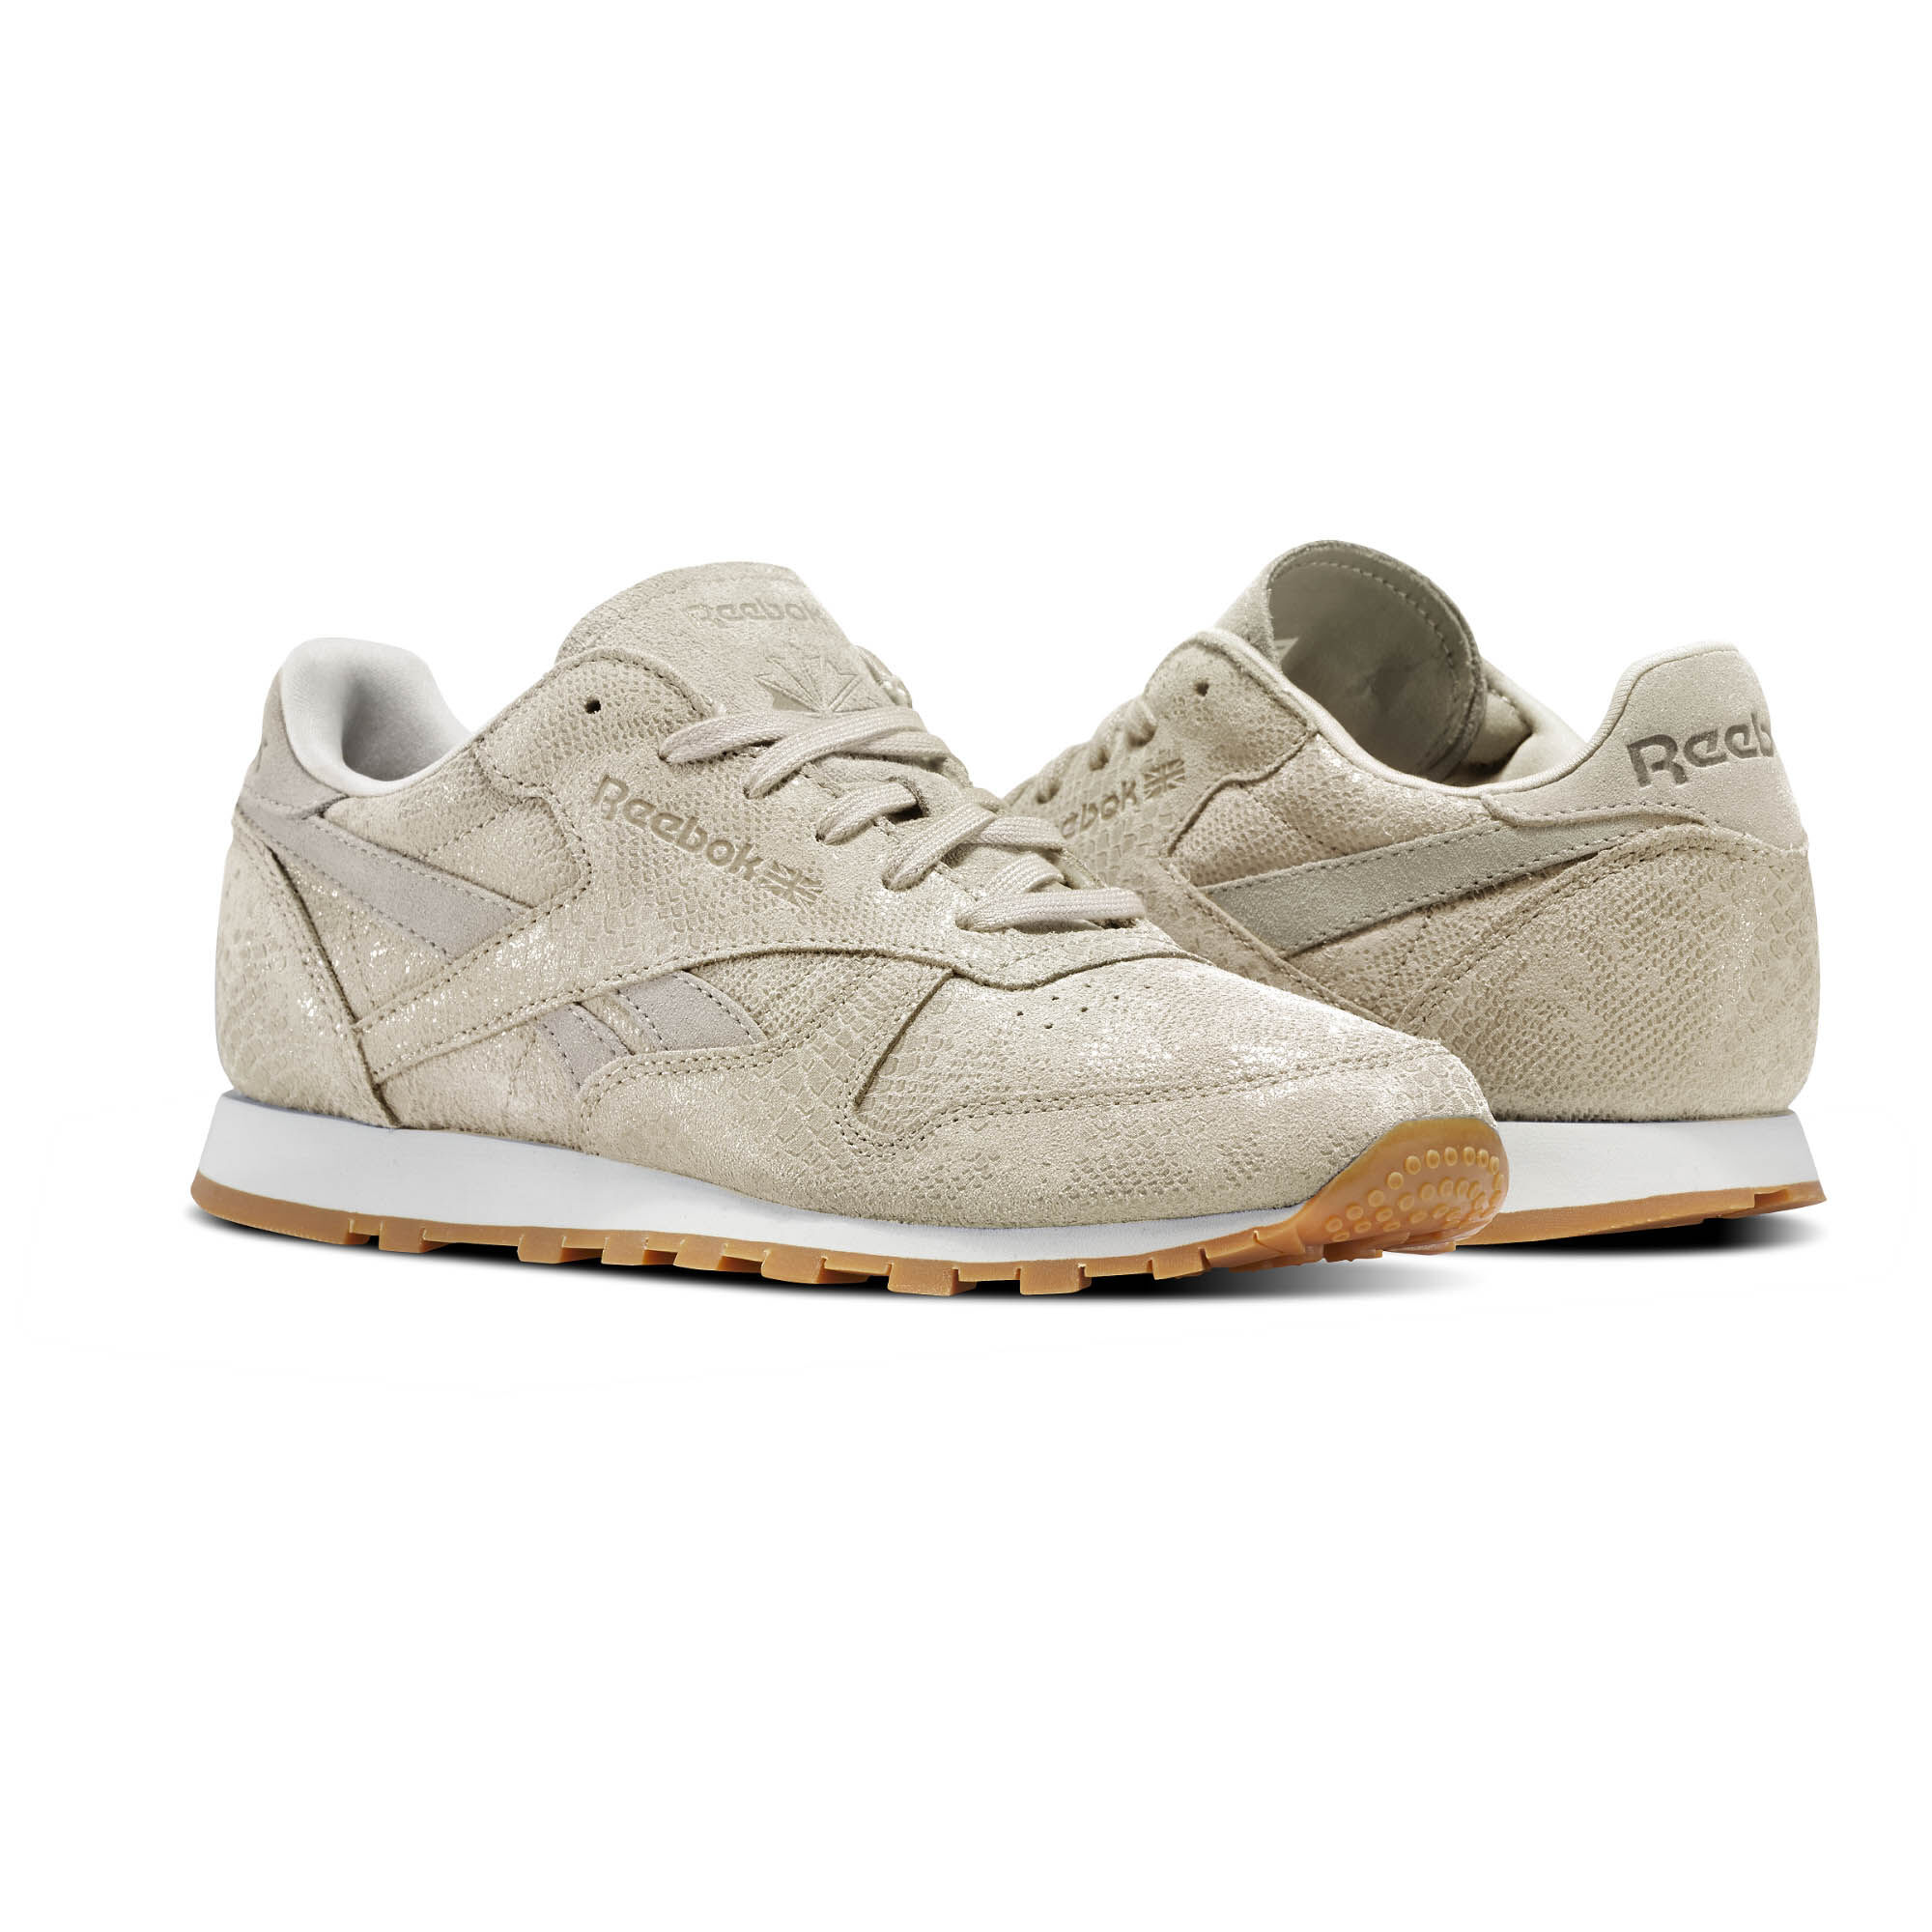 Reebok Cl Leather Clean Exoctics W Lo Sneaker Schuhe schwarz QhV1ZR1VP